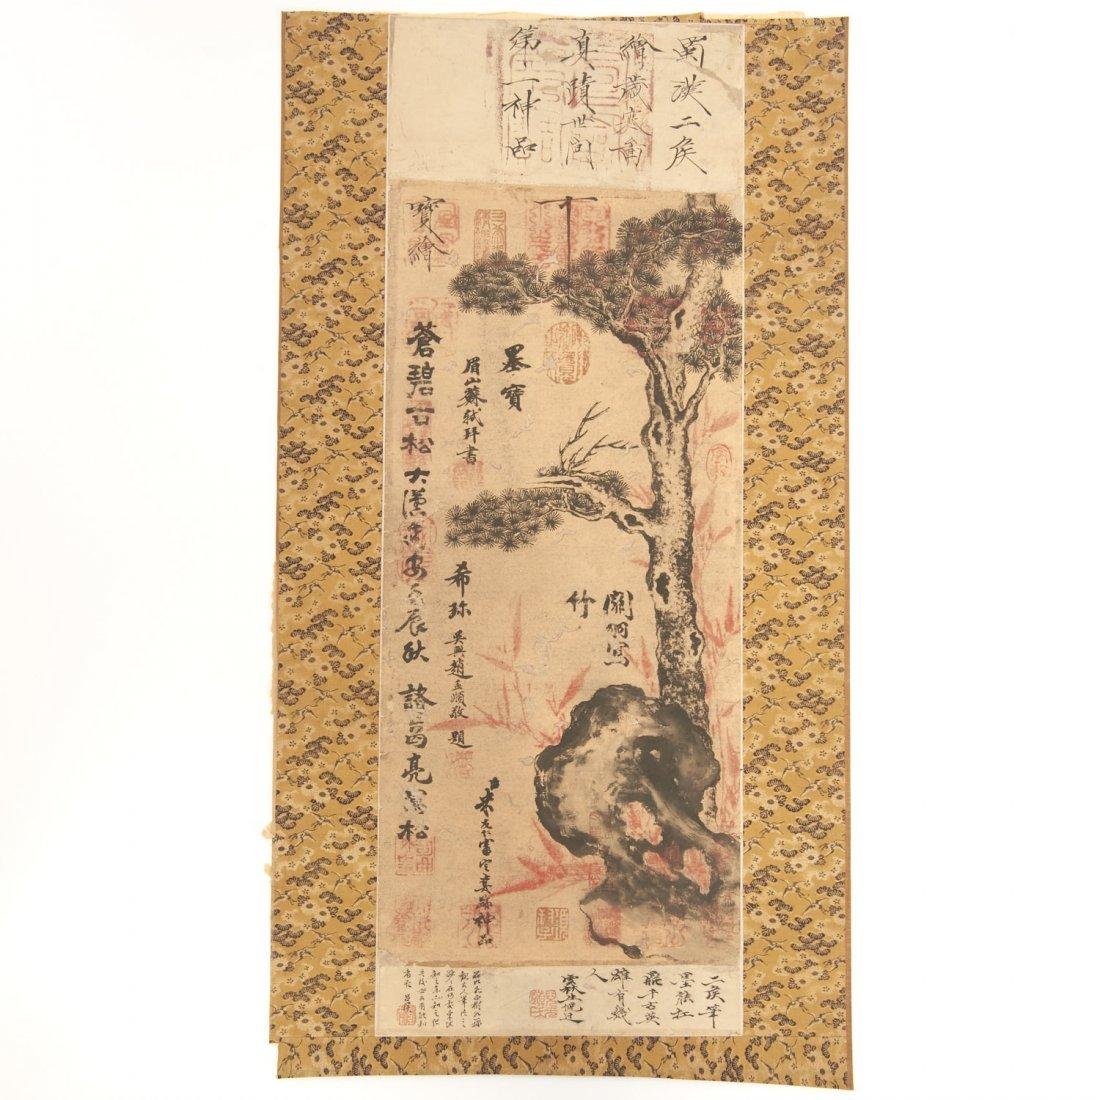 Manner of Wen Zhengming, literati painting